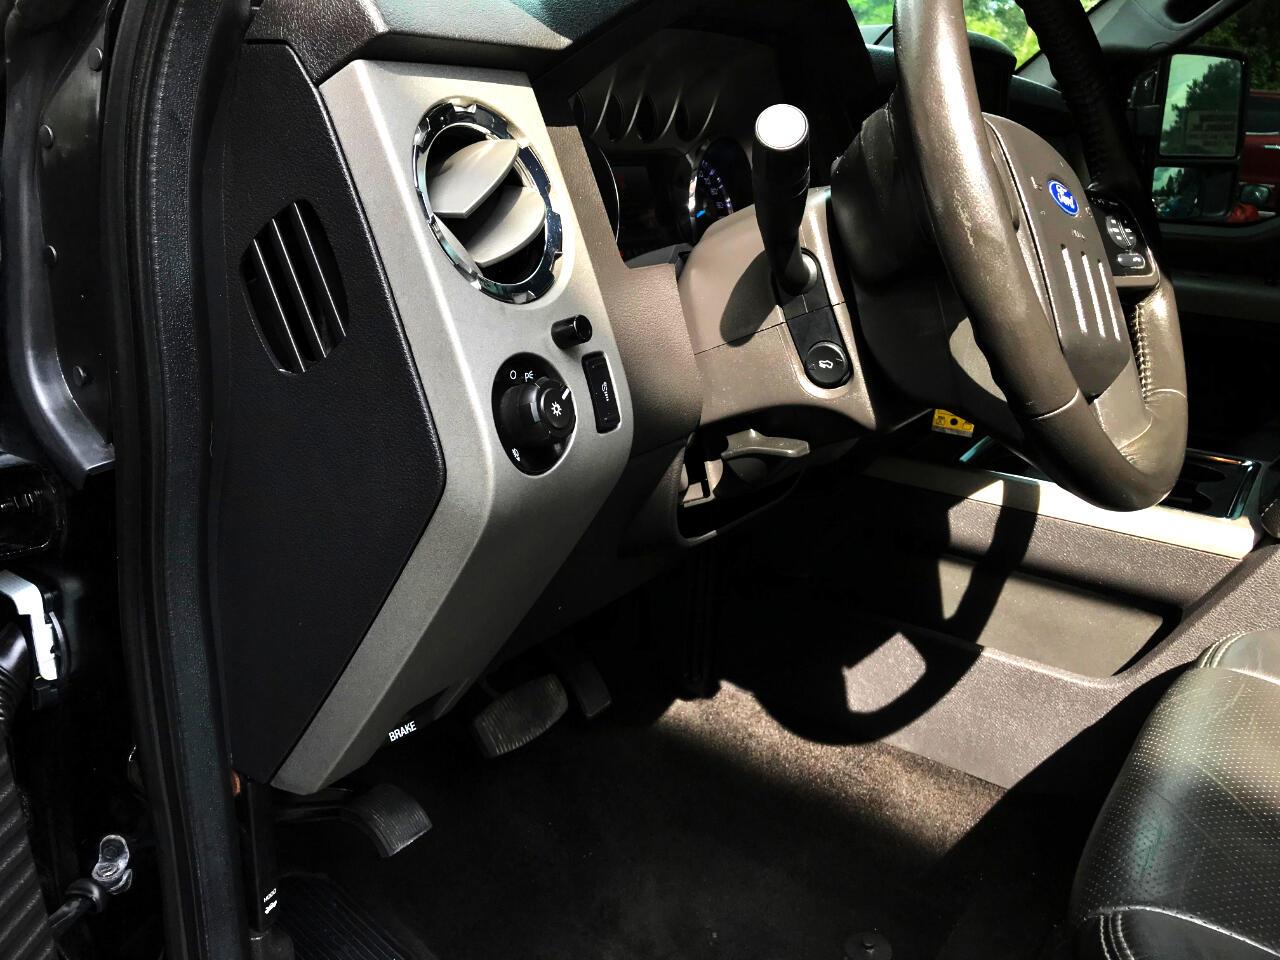 2016 Ford F-250 SD Lariat Crew Cab 4WD